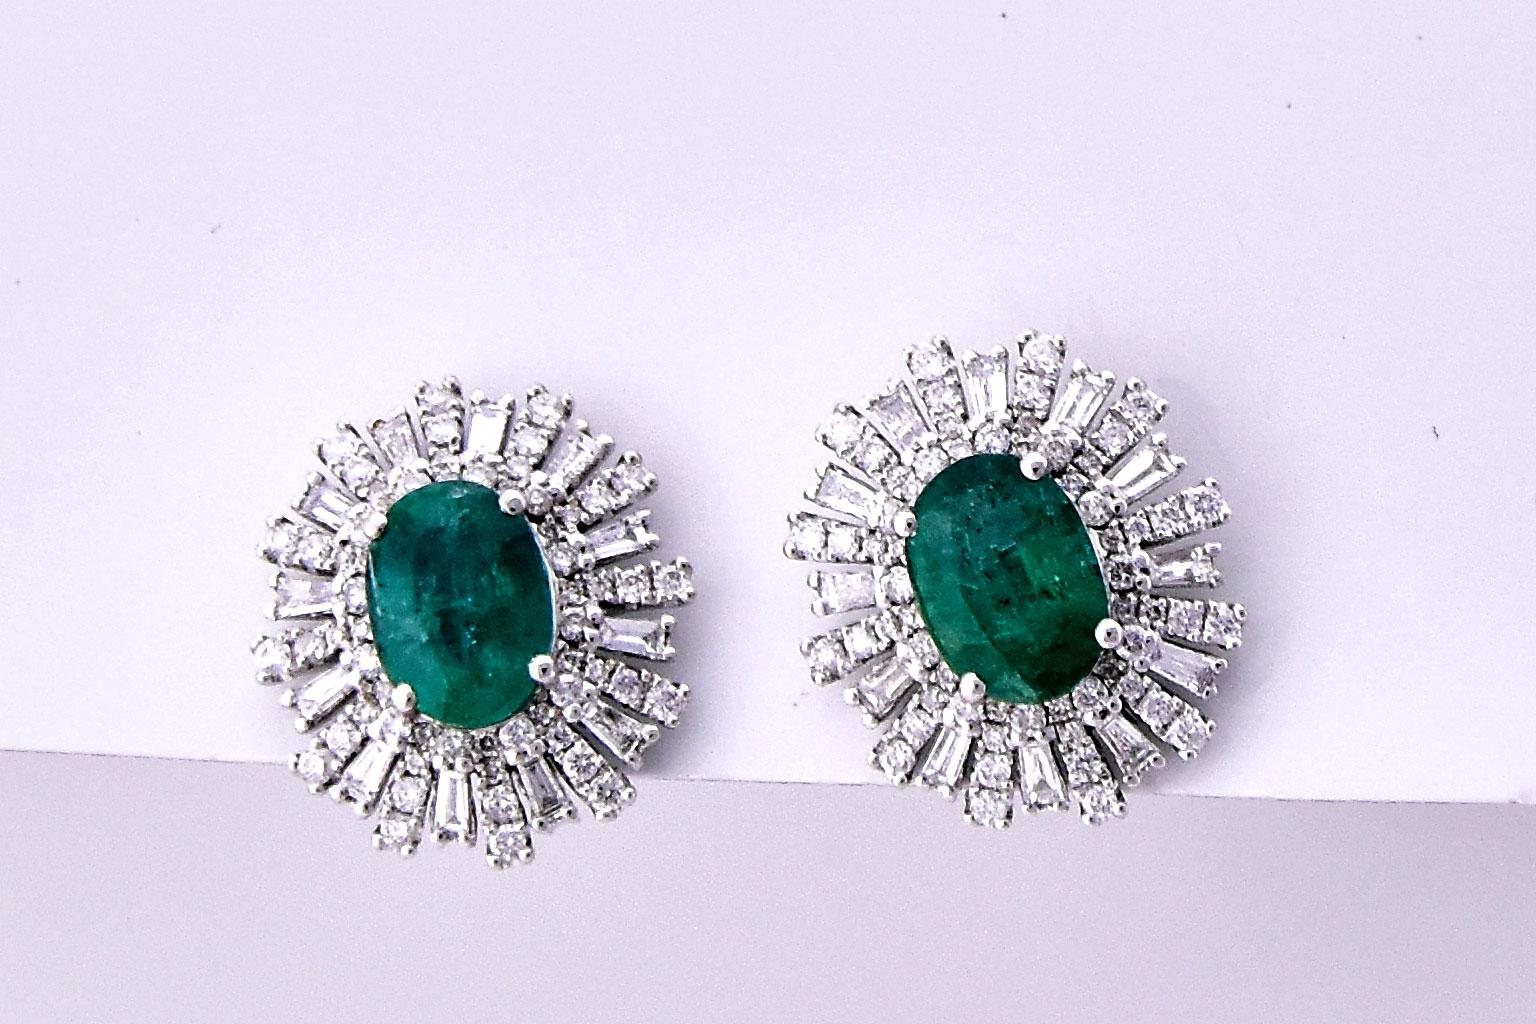 Over 2 Carats Emerald & Diamond Earrings